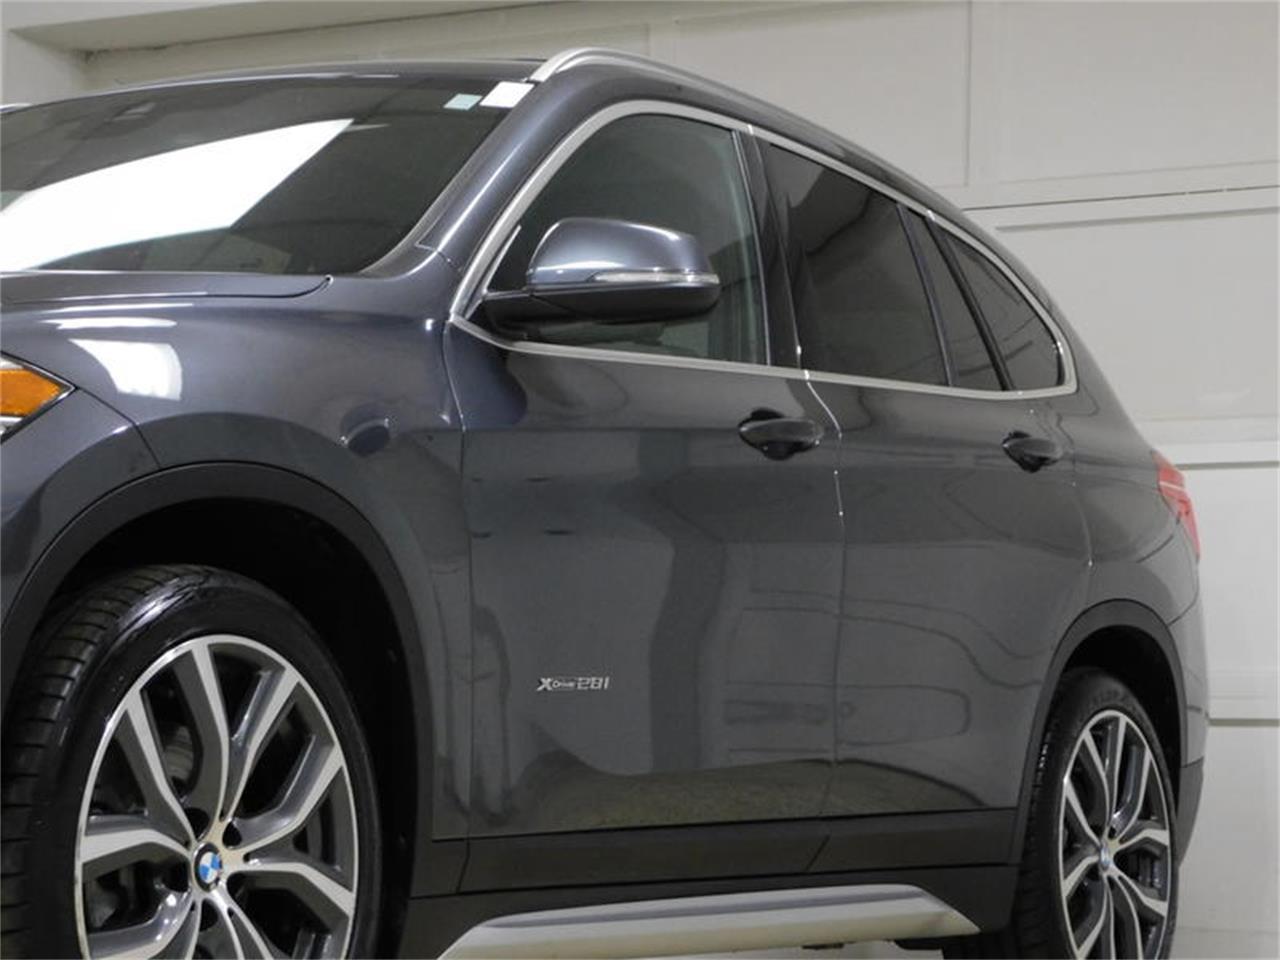 2016 BMW X1 (CC-1303467) for sale in Hamburg, New York